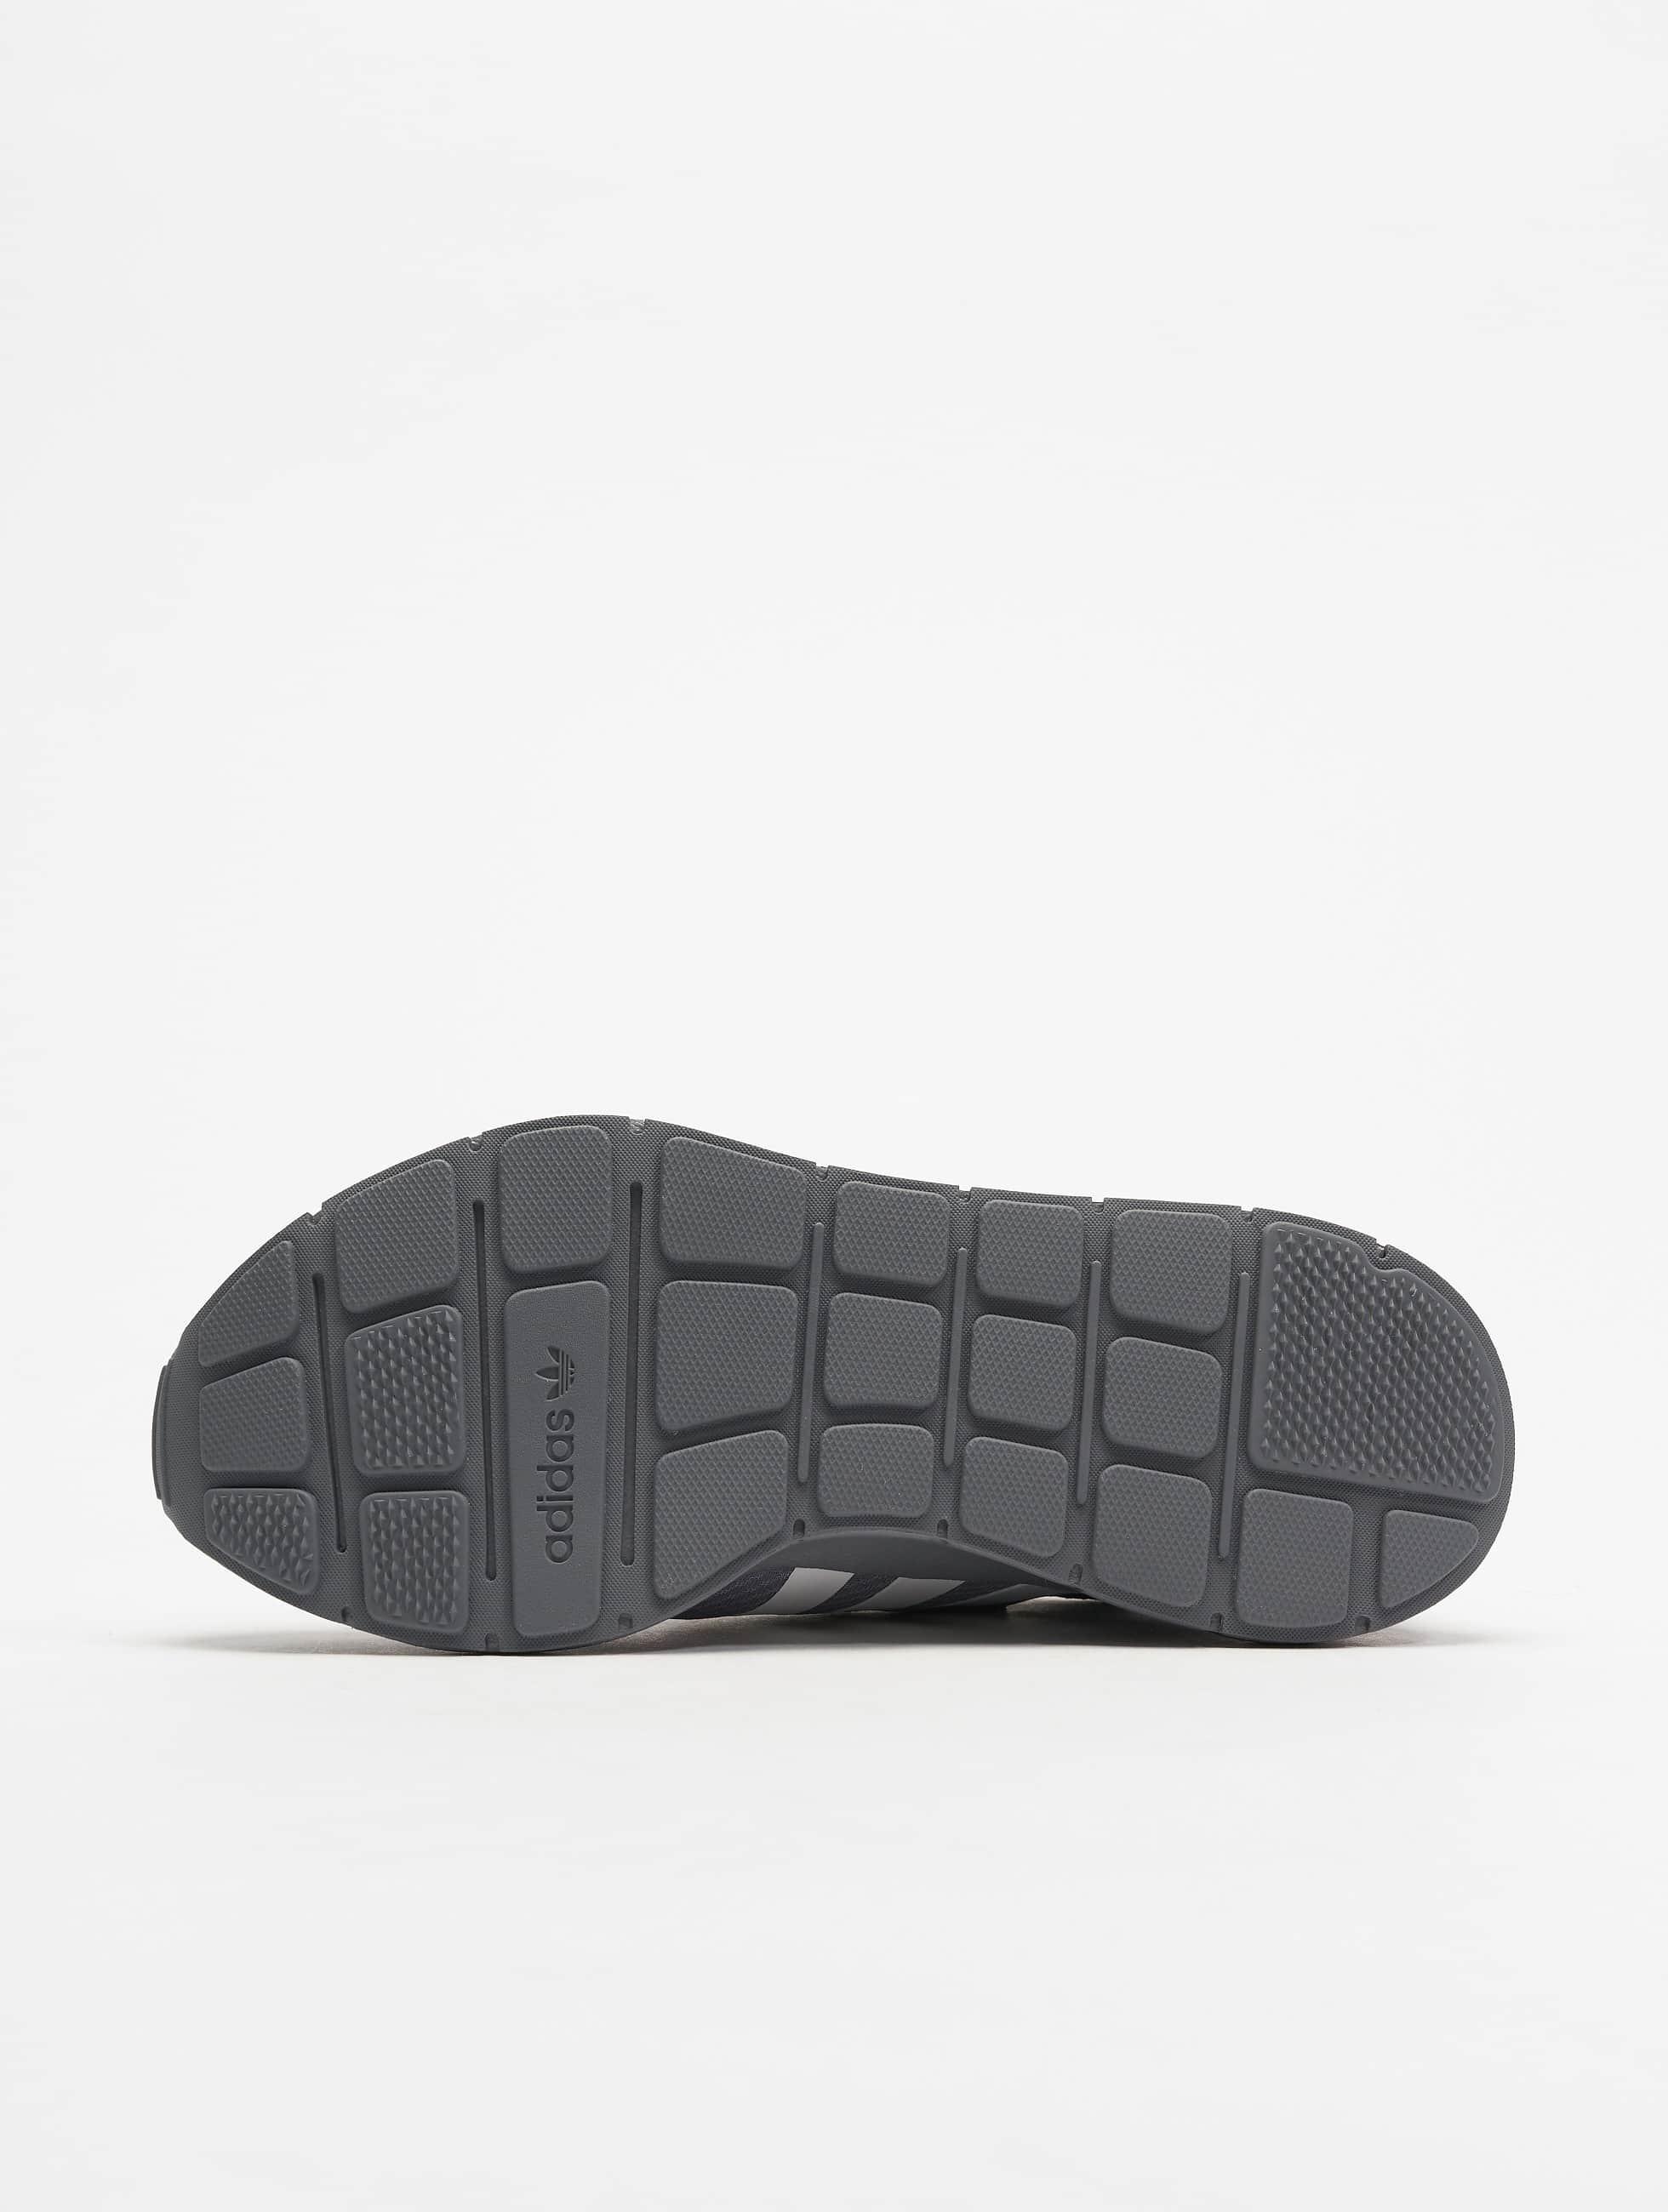 Adidas originals Herren Schuhe Turnschuhe Originals Swift